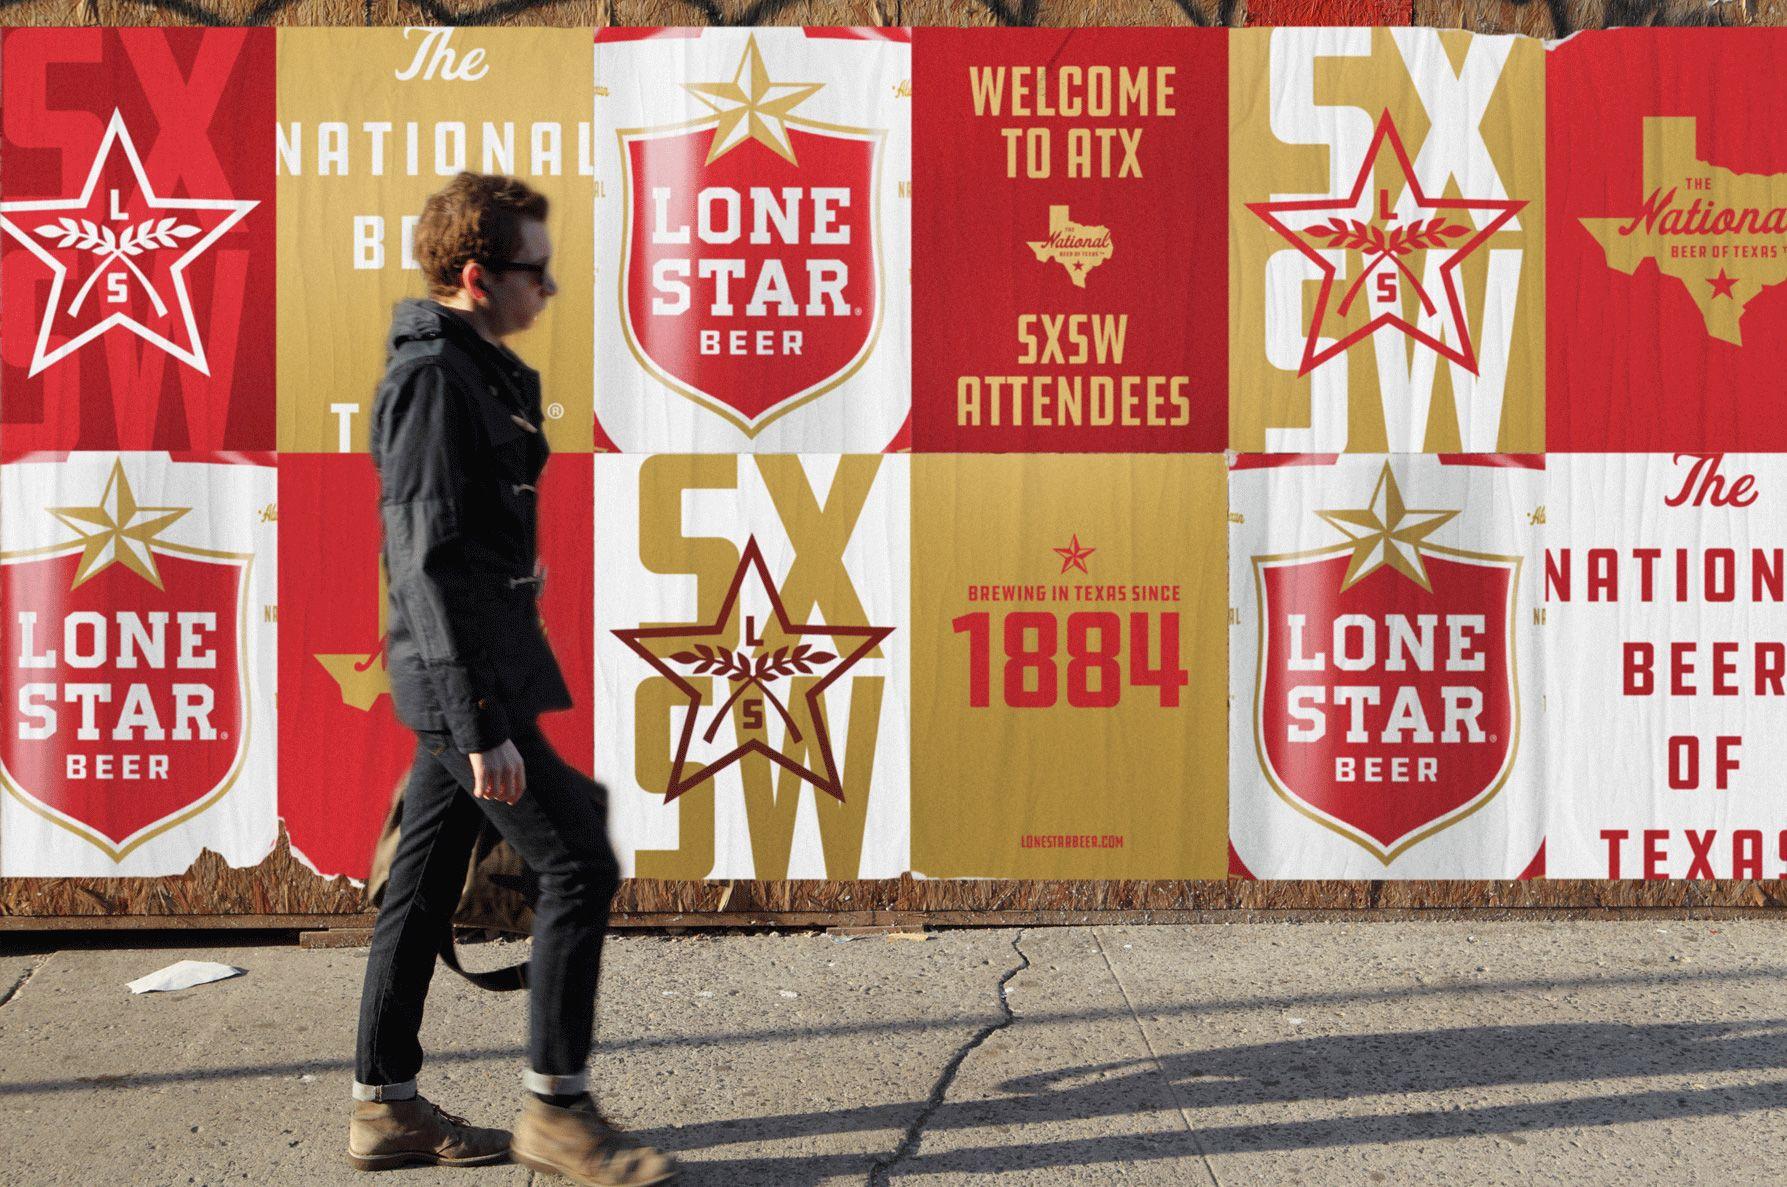 texas lone star card app